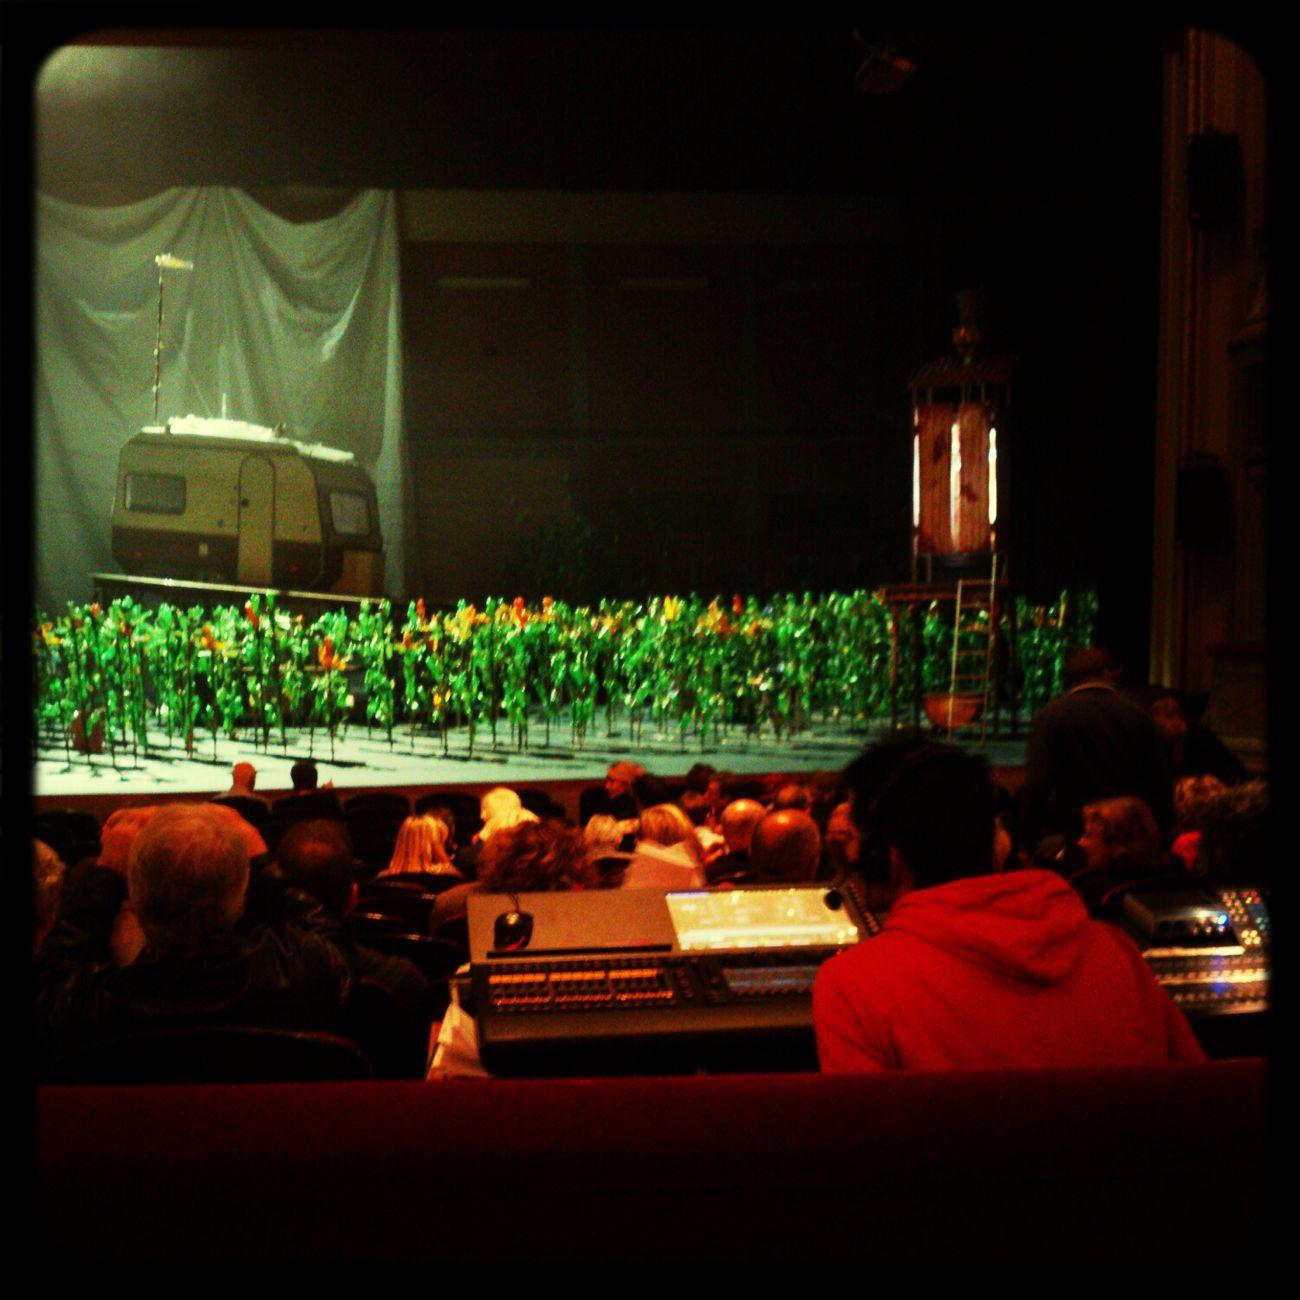 ROtheater: vreugde tranen drogen snel Bottles Decor Theater Watching